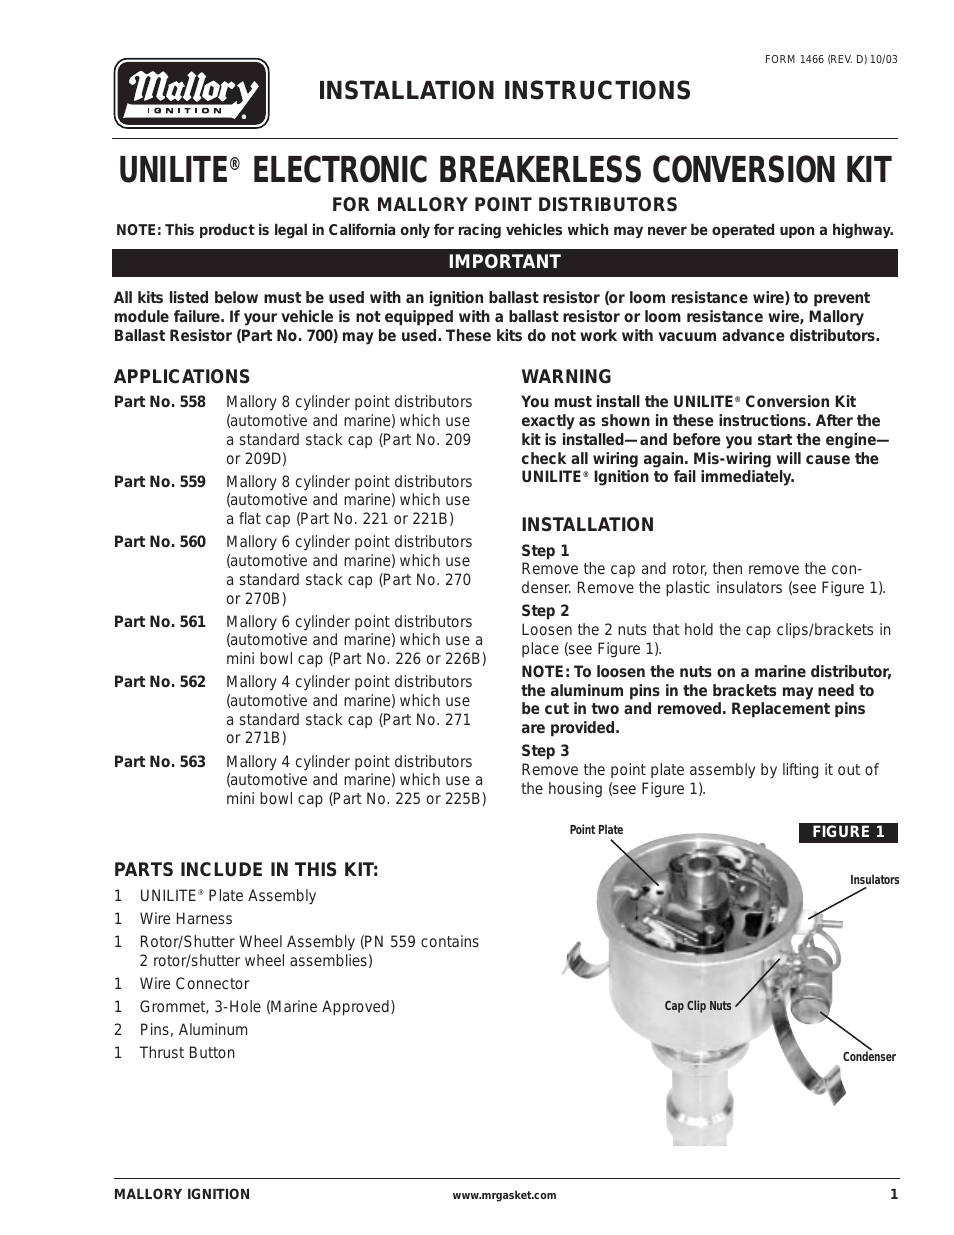 Mallory Magnetic Breakerless Wiring Diagram | Wiring Diagram - Mallory Magnetic Breakerless Distributor Wiring Diagram